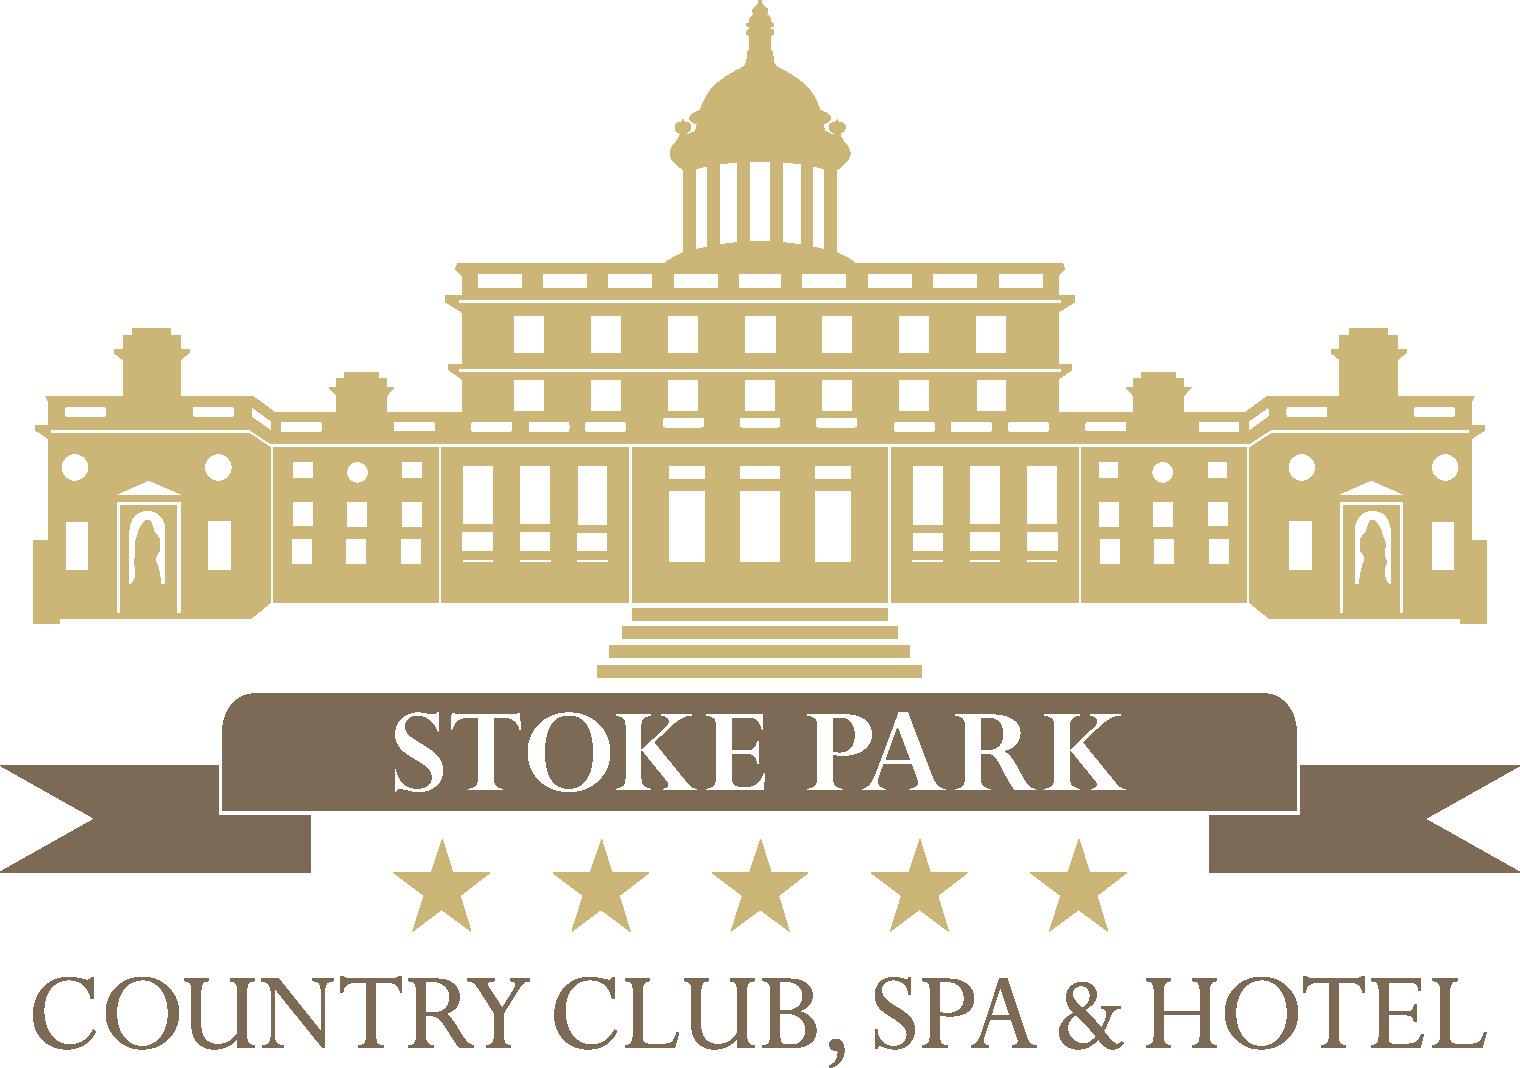 Stoke park logo.png